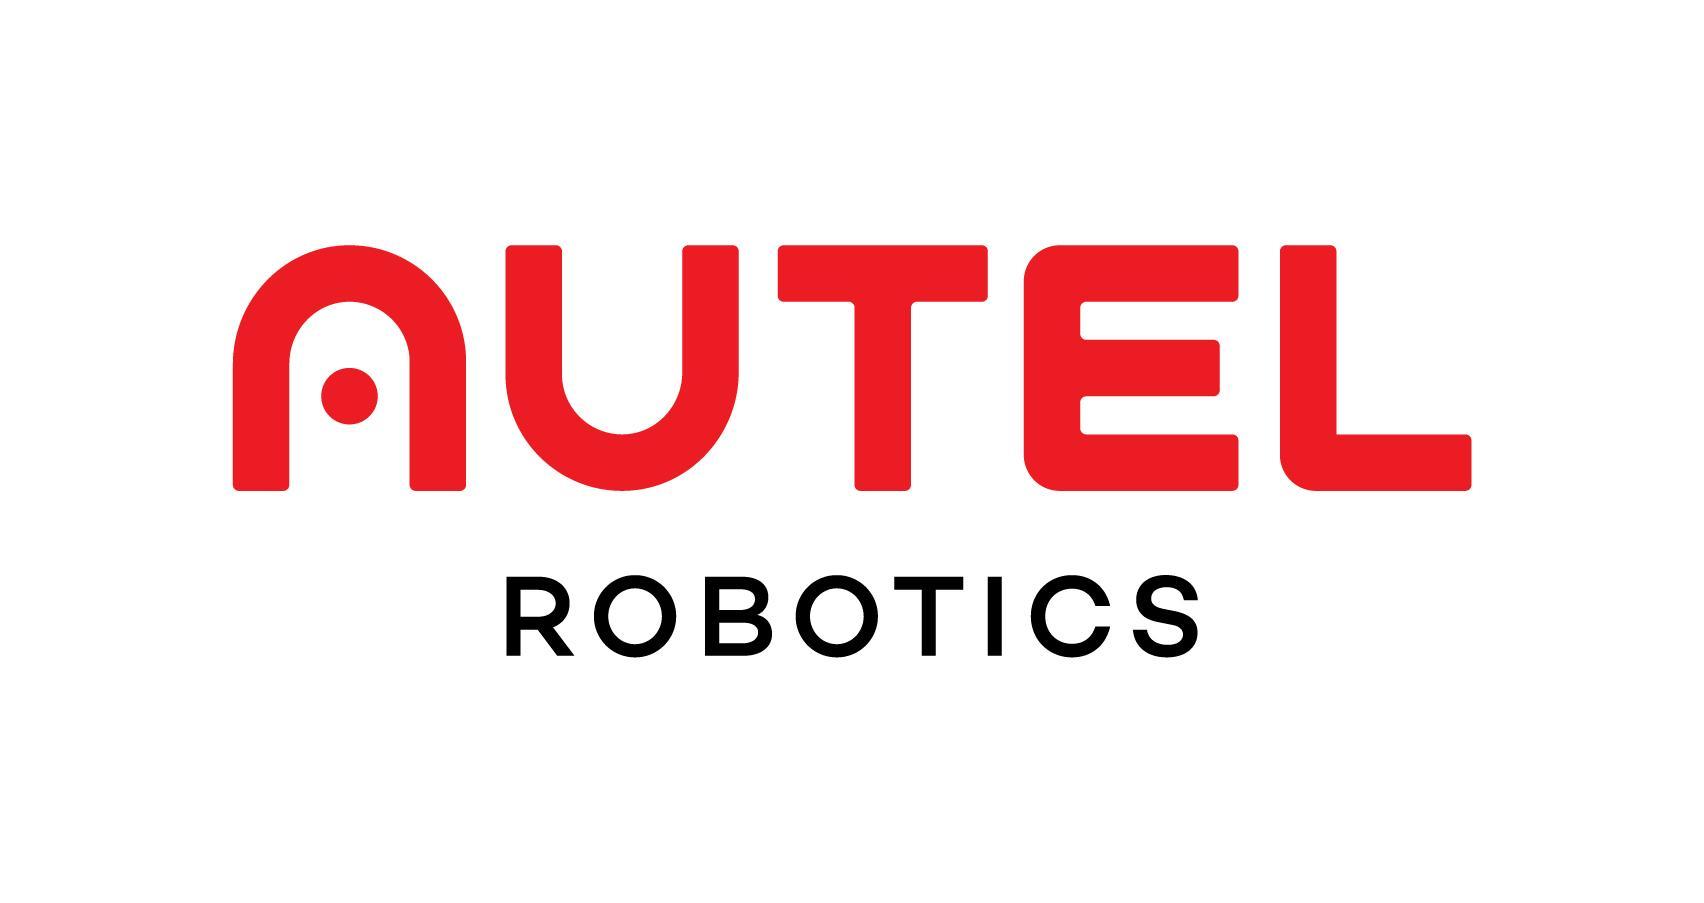 Autel Robotics company logo